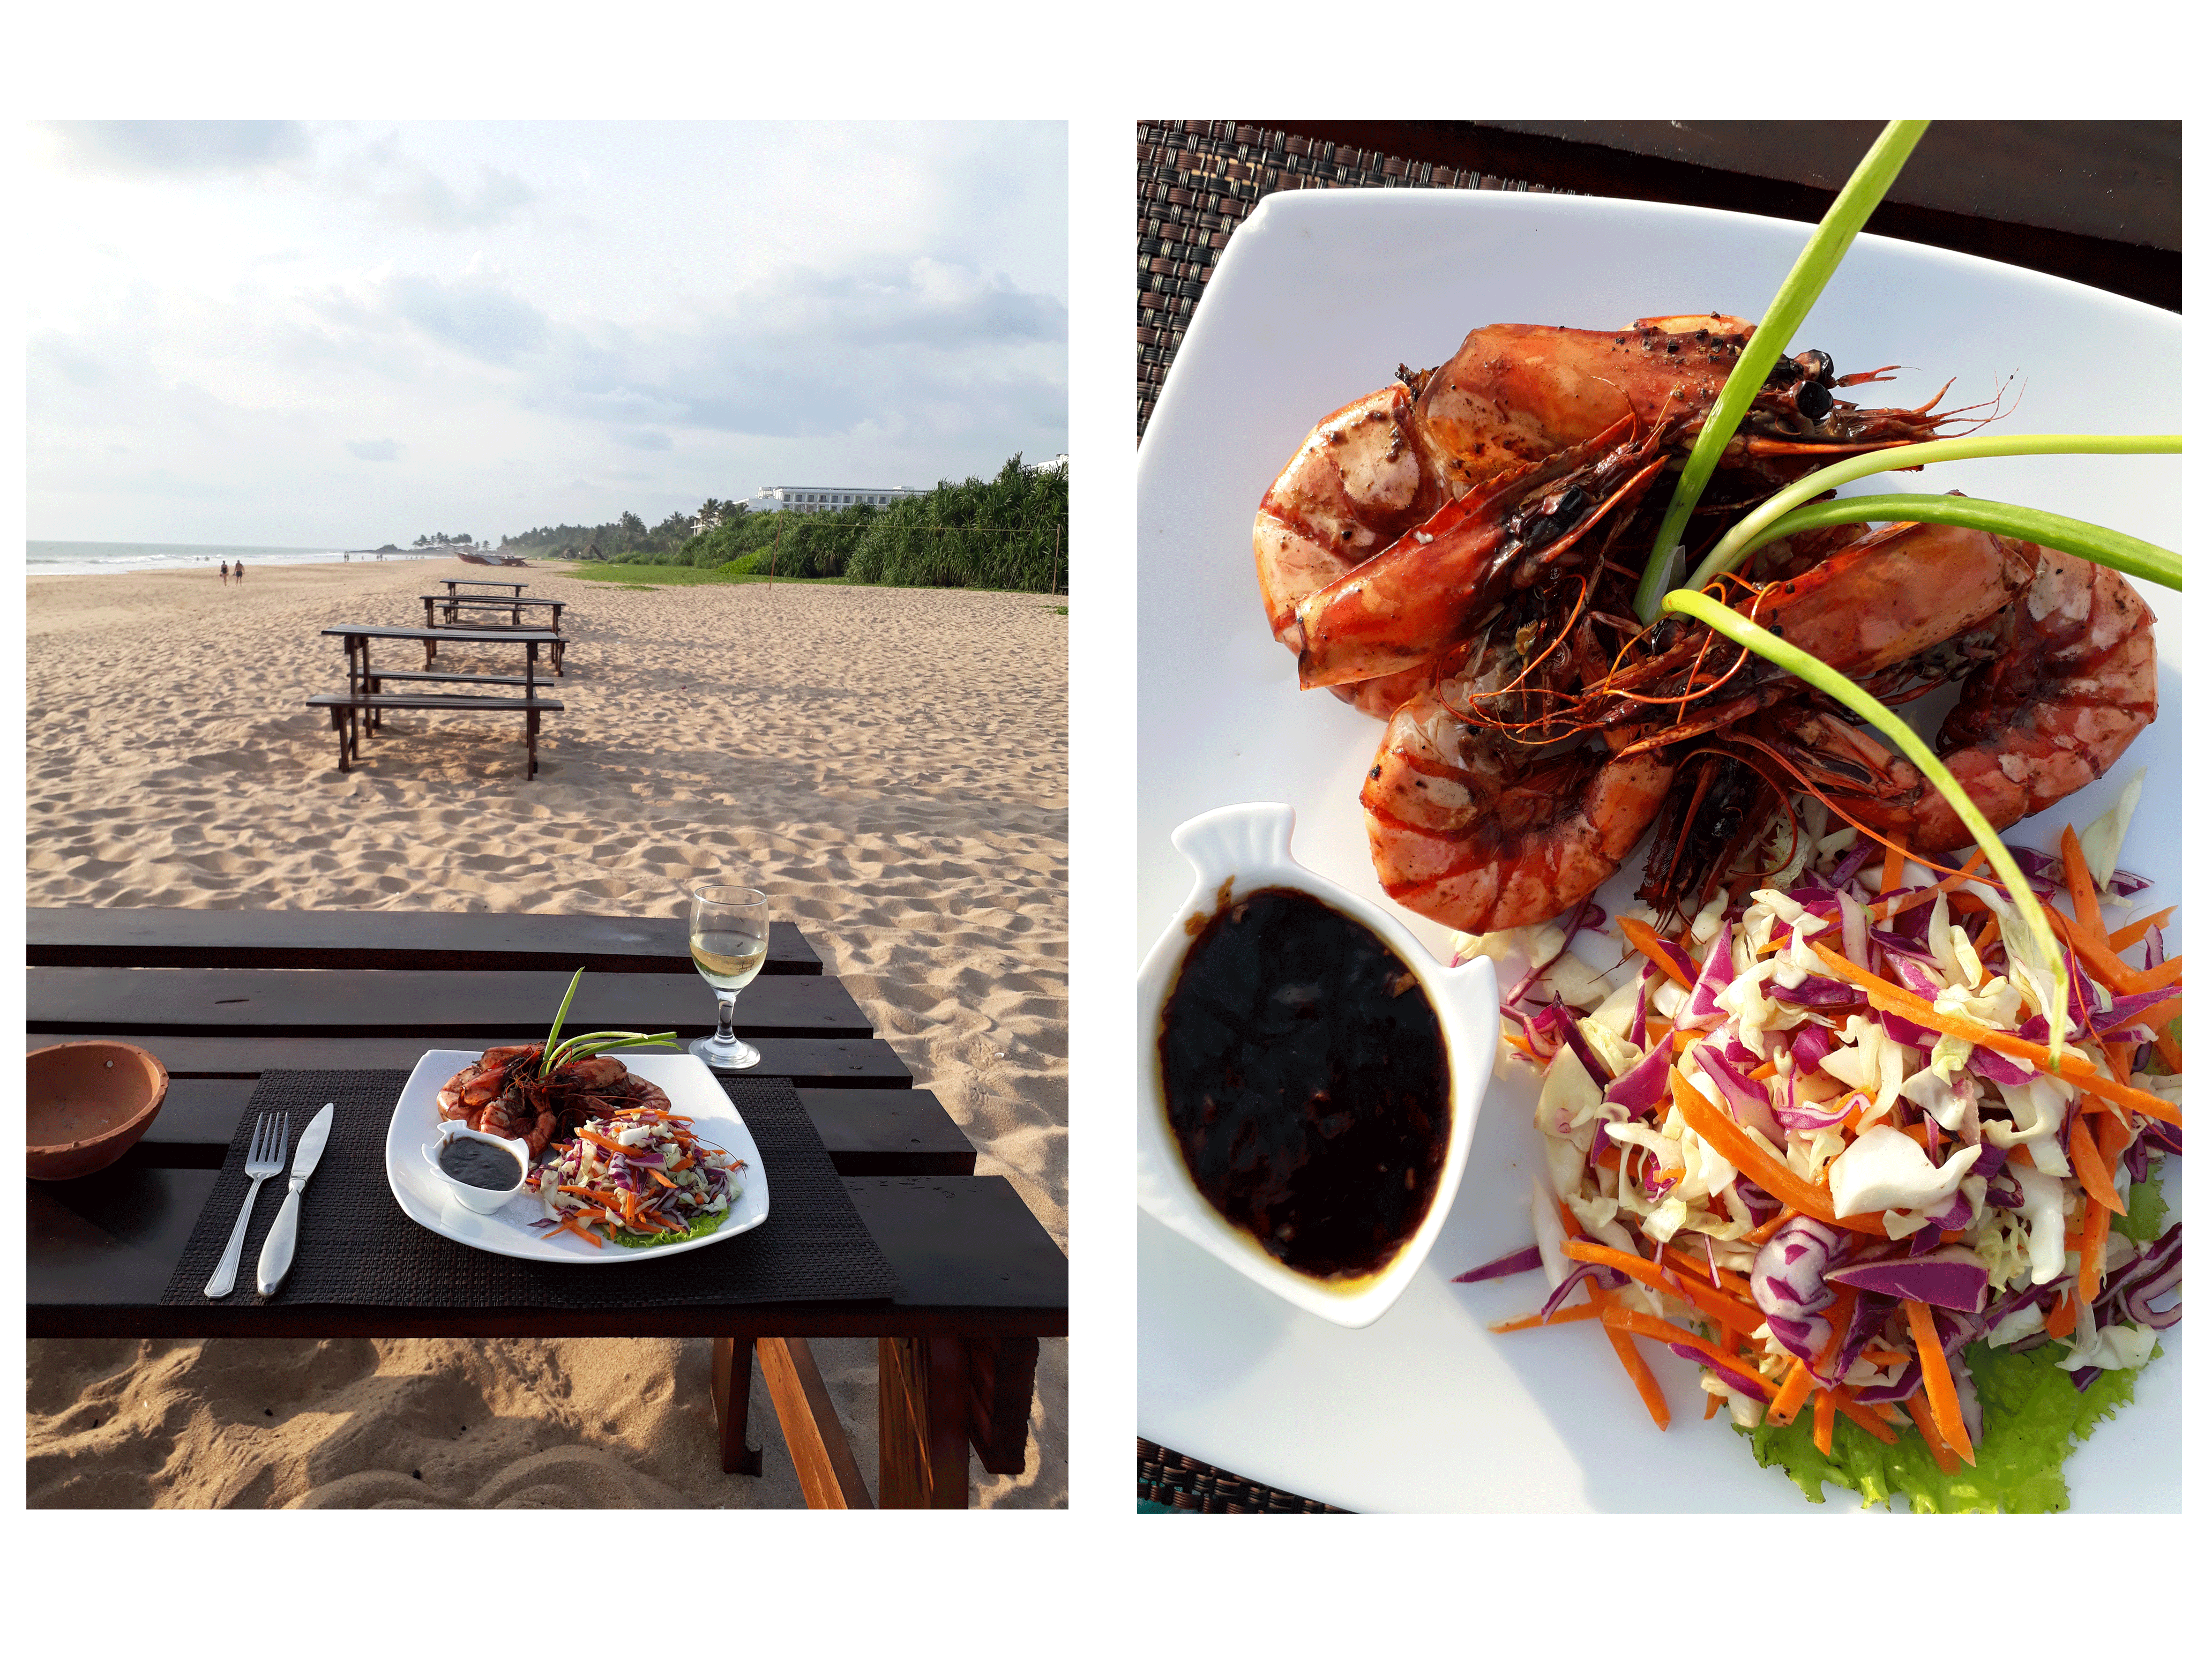 Ahungalla-Beach-Srilanka_2